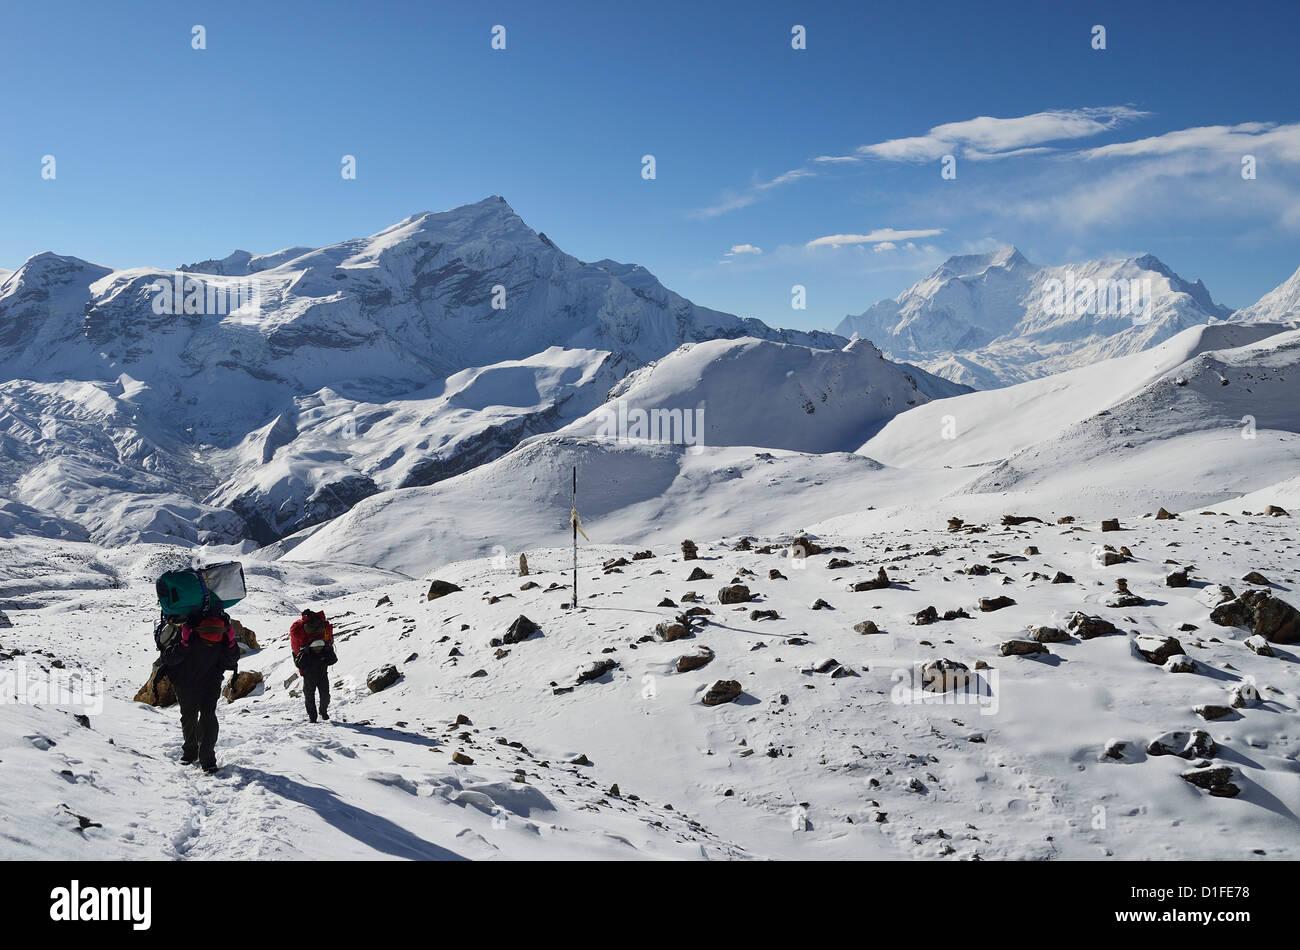 Thorong La (Thorung La), einen Pass auf 5416m, Annapurna Conservation Area, Gandaki, Western Region (Pashchimanchal), Stockbild